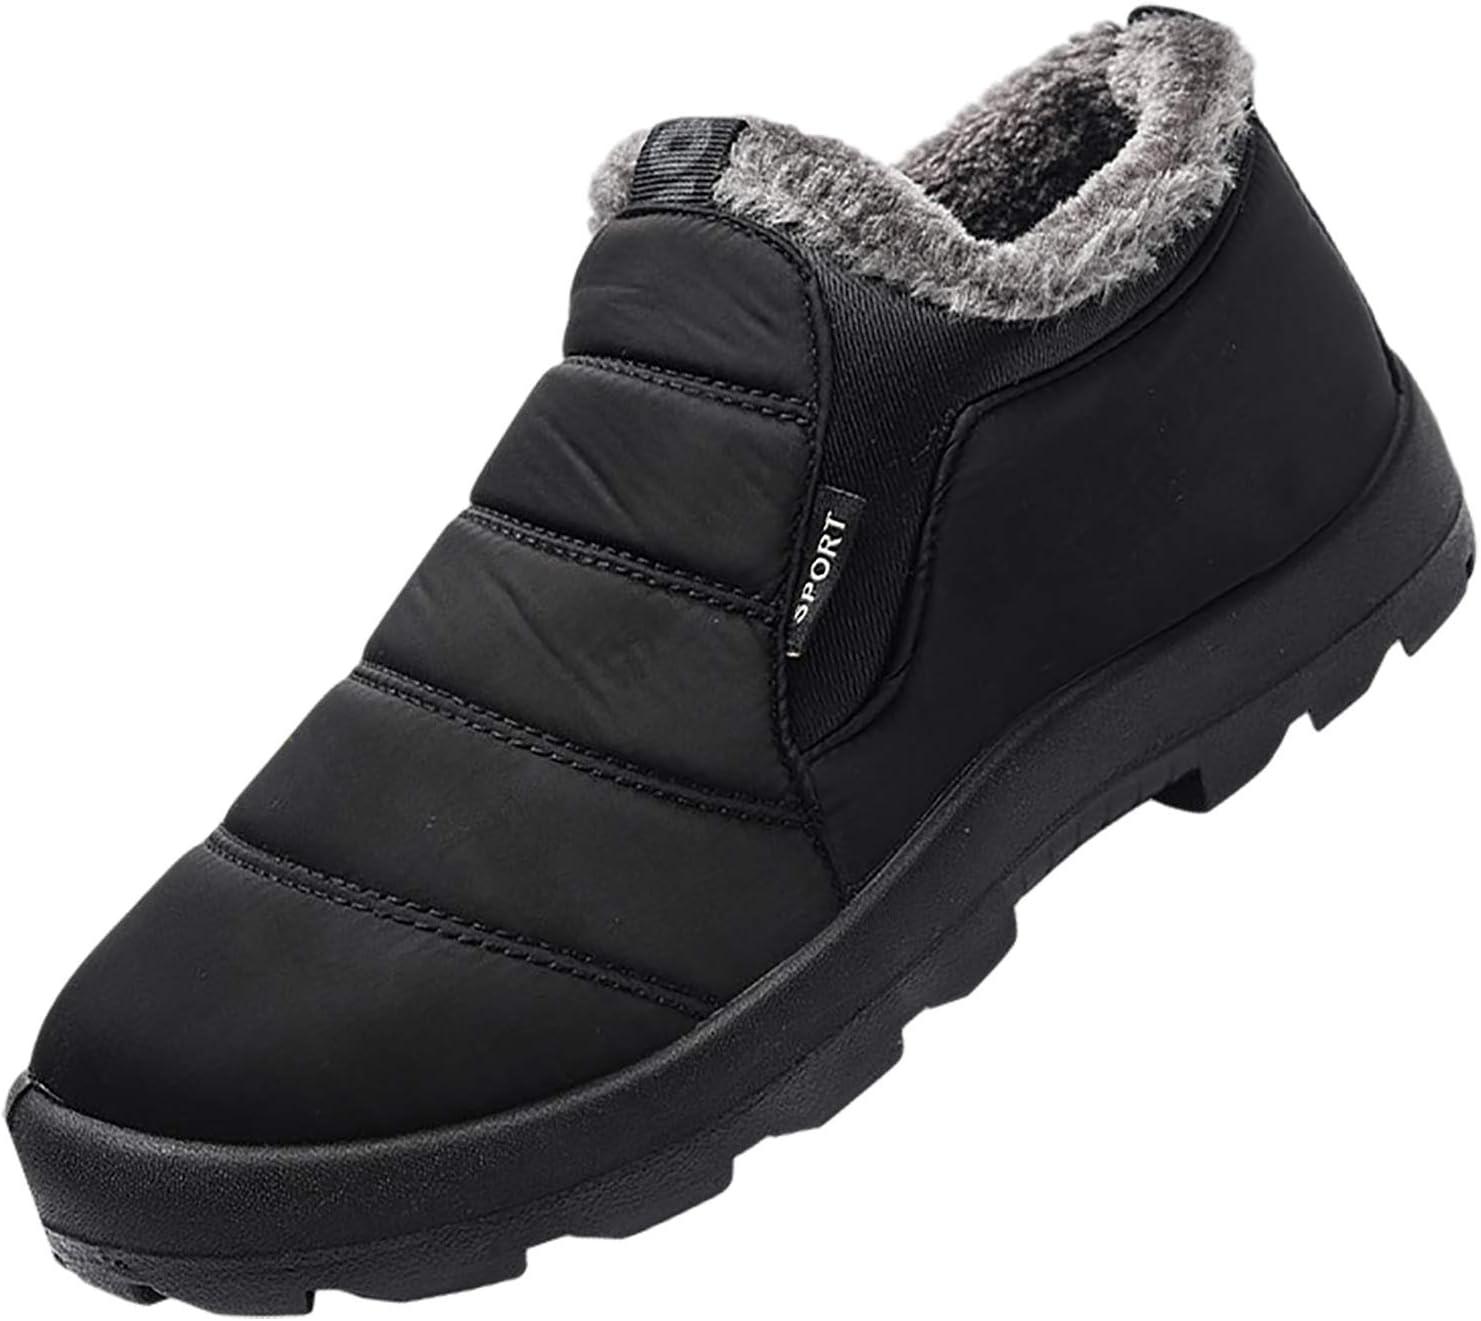 Mens Plus Velvet Warm Outdoor Sports Shoes Waterproof Snow Cotton Boots